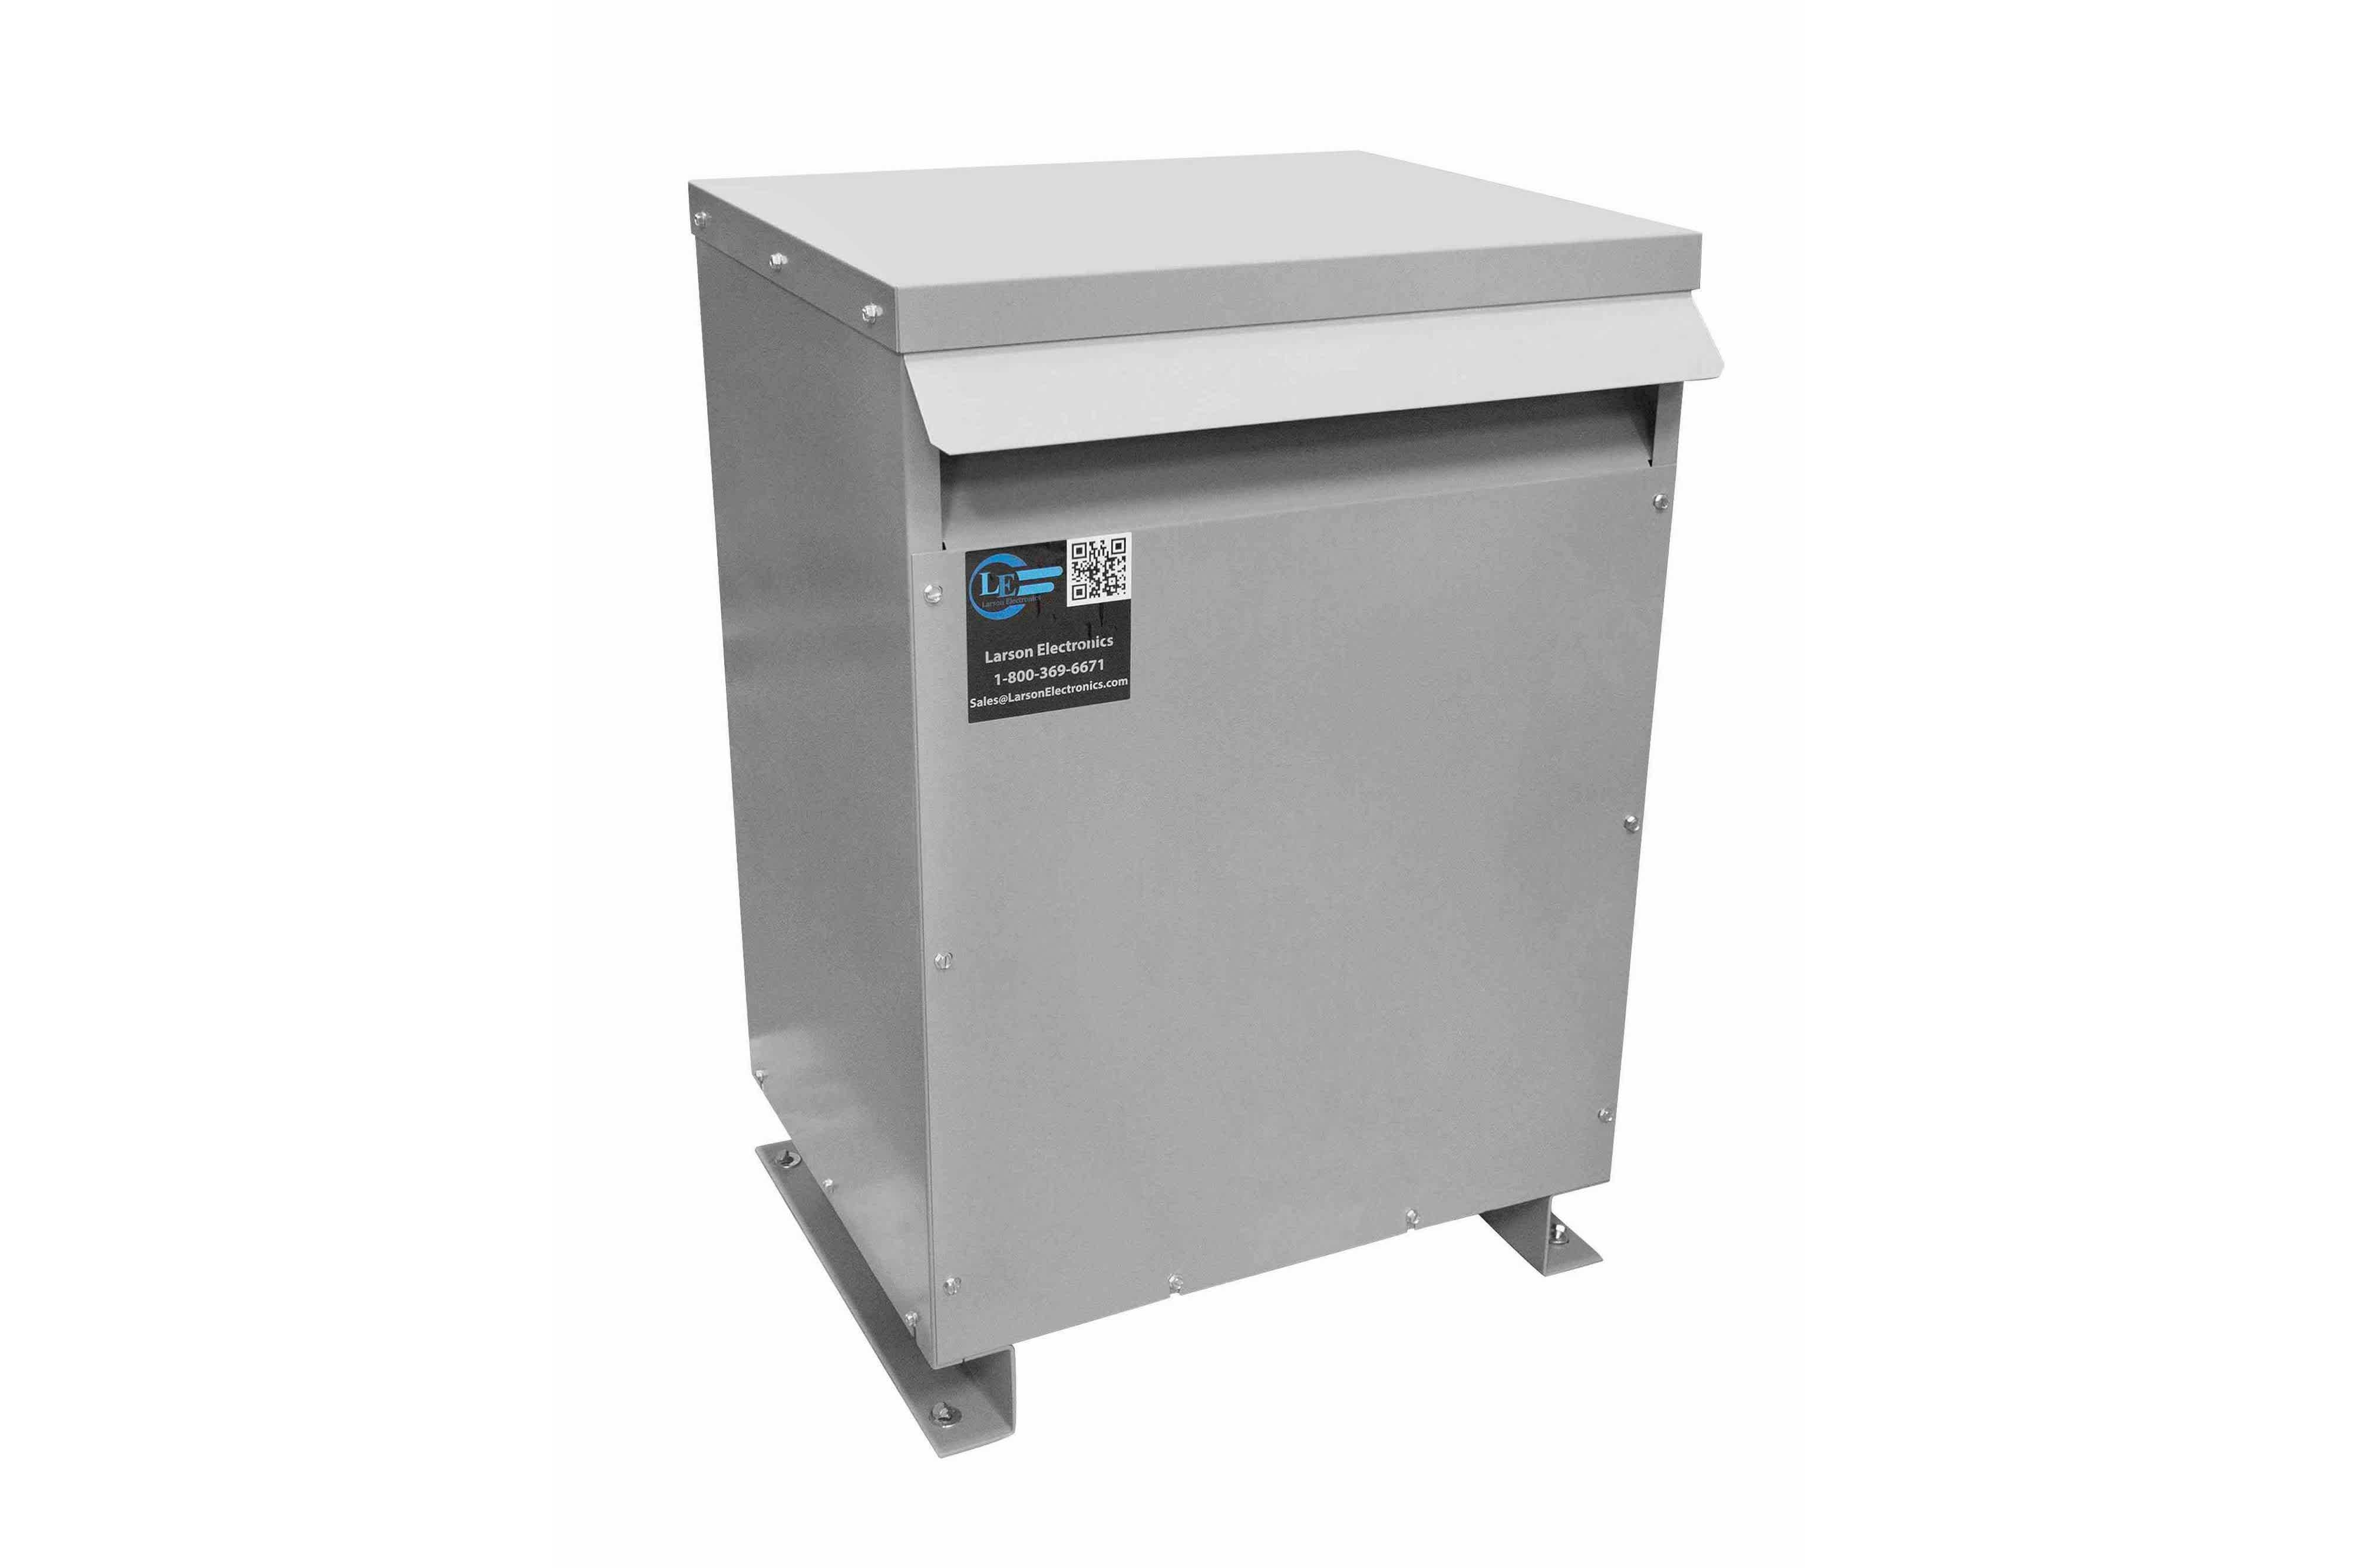 225 kVA 3PH Isolation Transformer, 415V Wye Primary, 480V Delta Secondary, N3R, Ventilated, 60 Hz